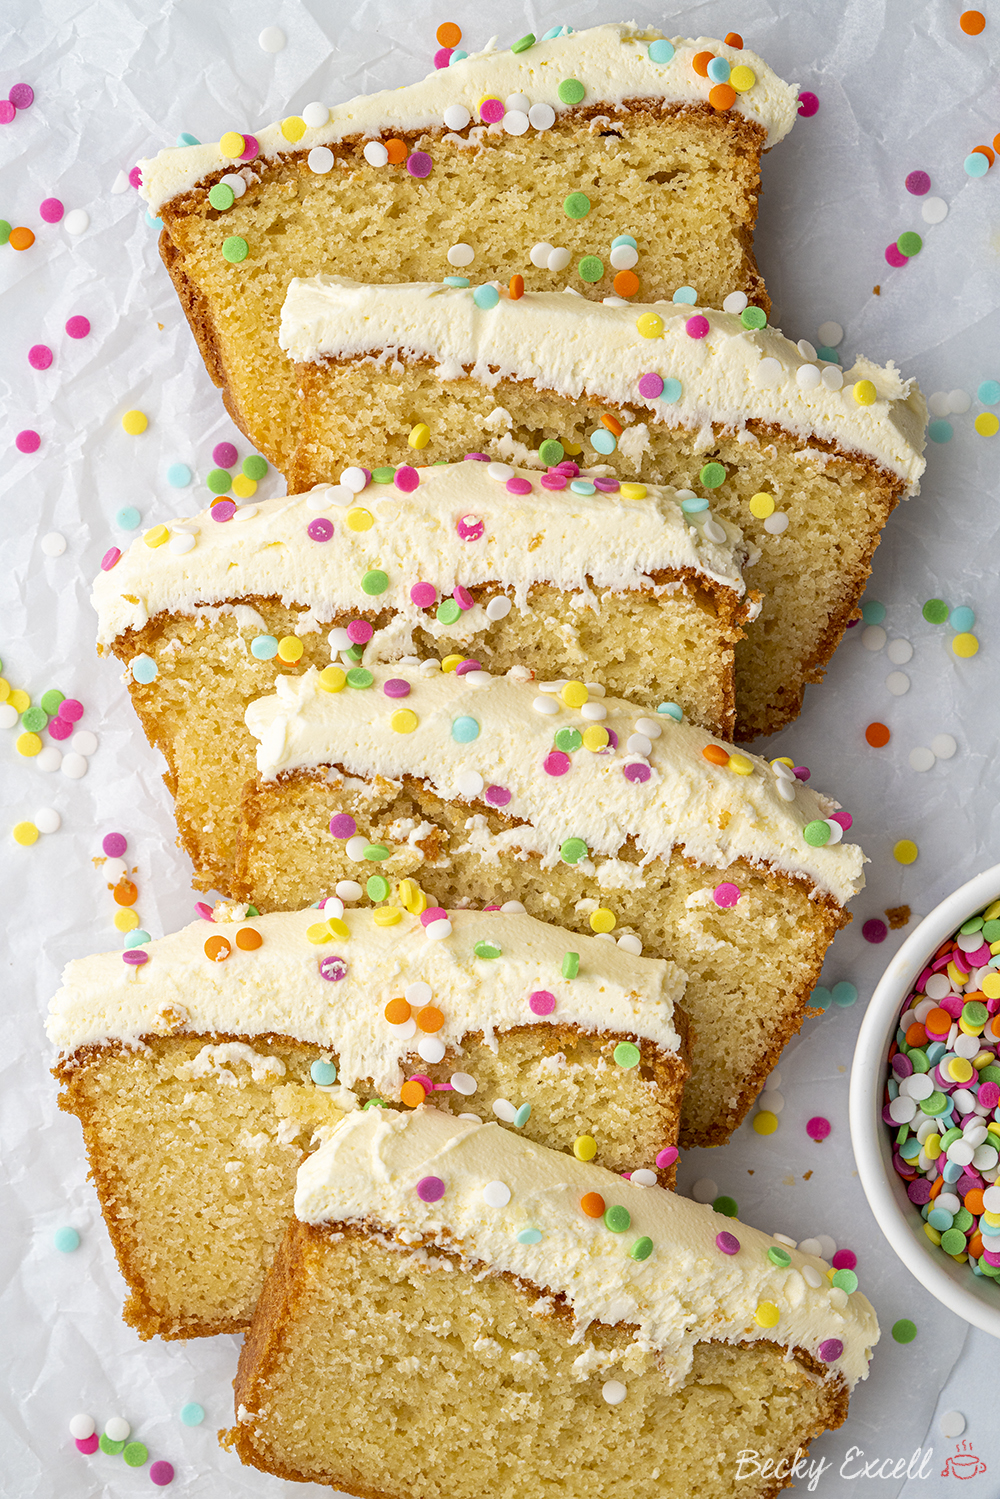 Gluten-free Vanilla Loaf Cake Recipe - BEST EVER! (dairy-free option)